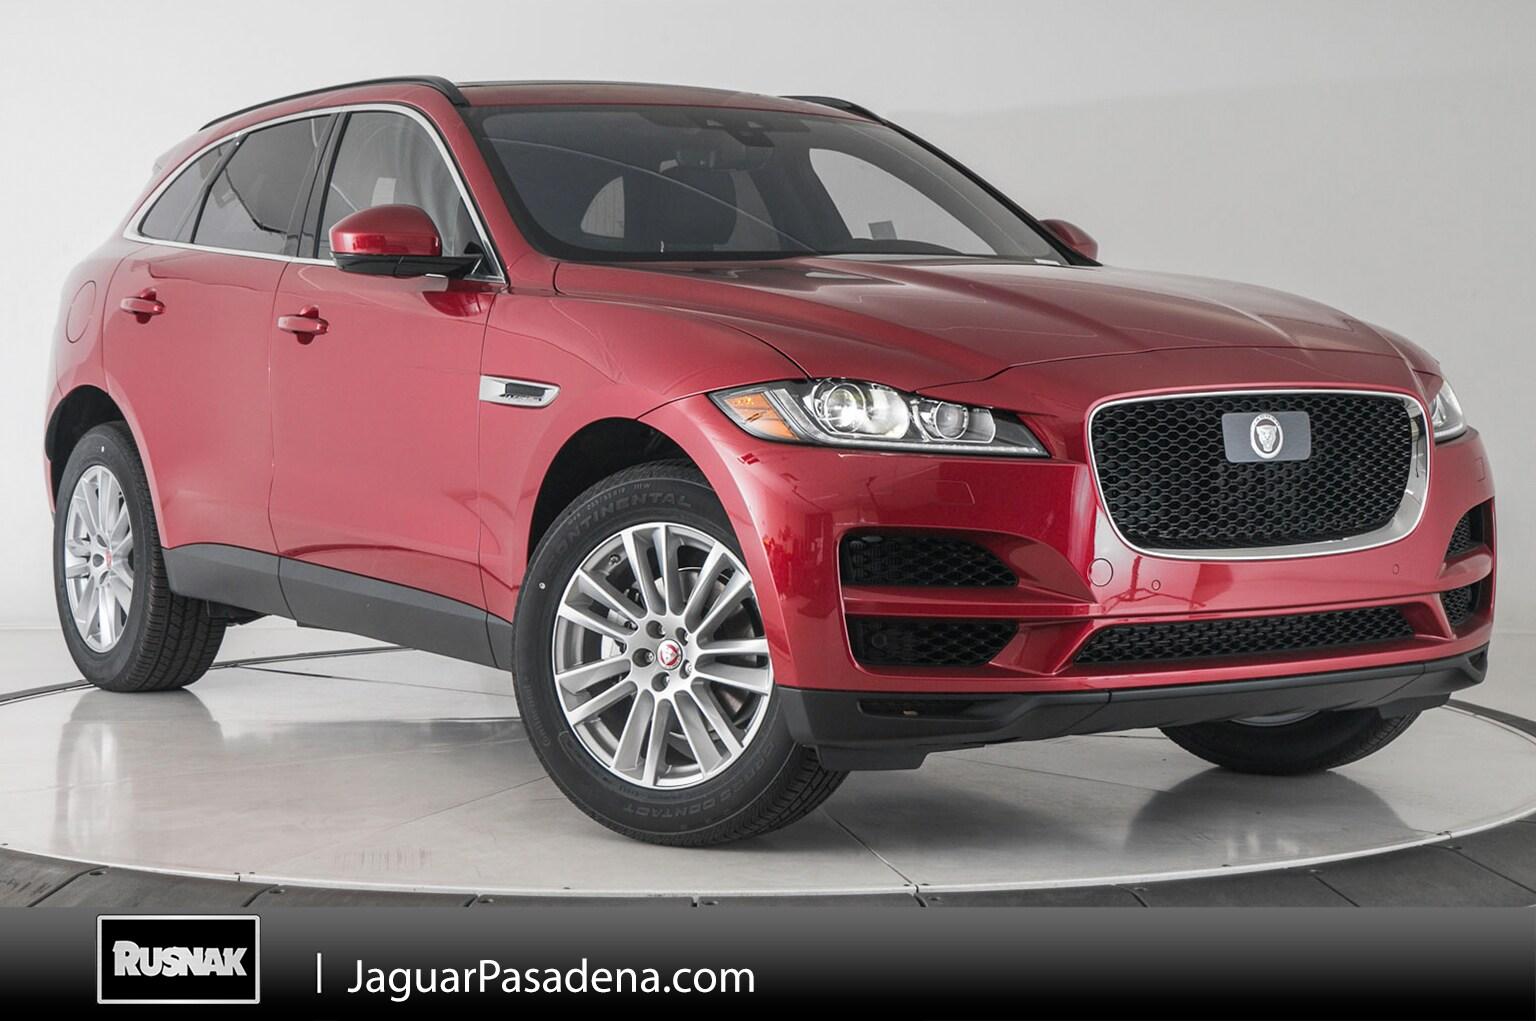 New 2019 Jaguar F-PACE Prestige SUV For Sale Los Angeles California